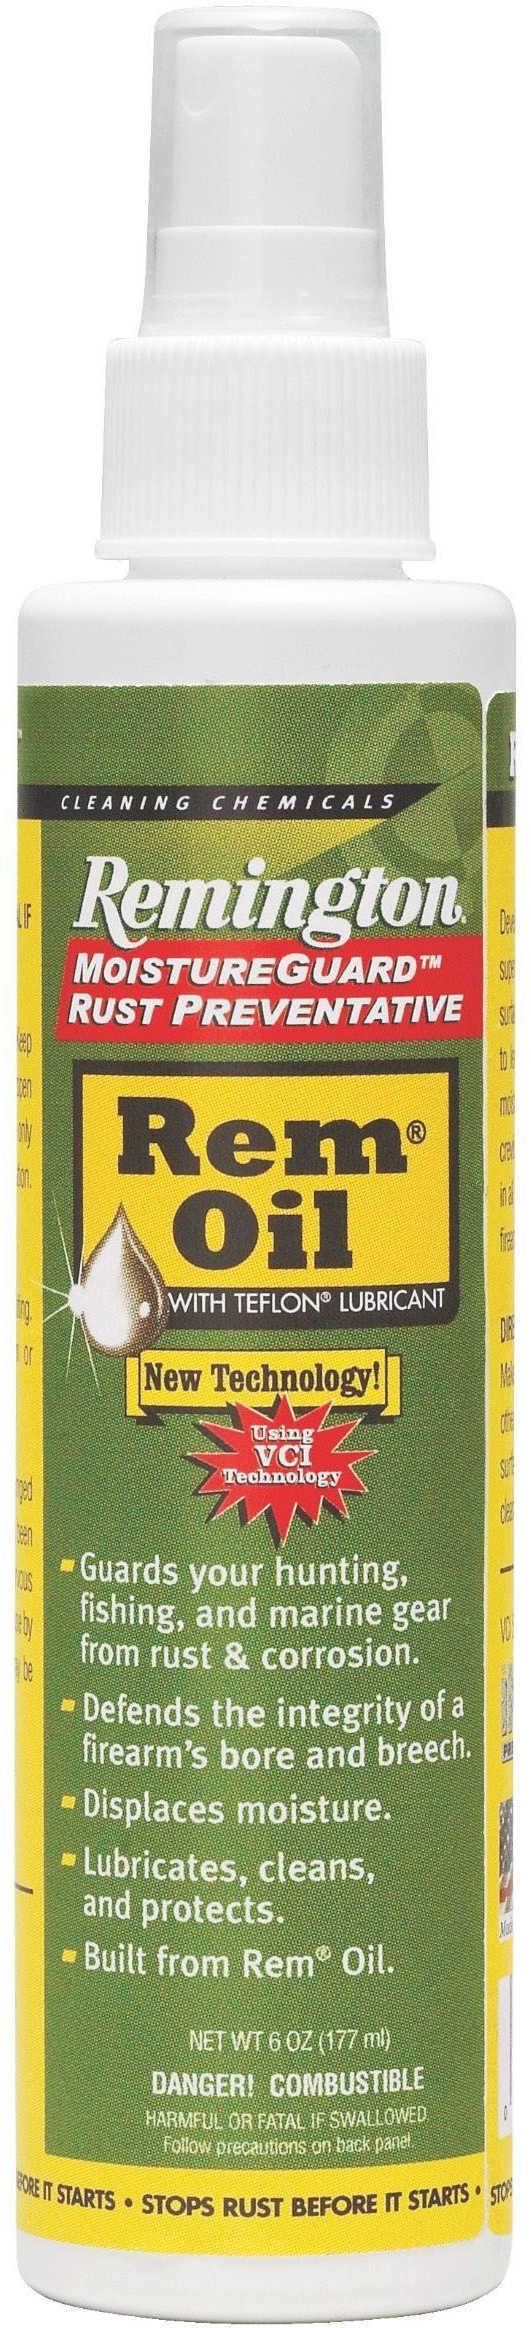 Remington Moisture Guard With Remington Oil 6Oz Pump Spray(6